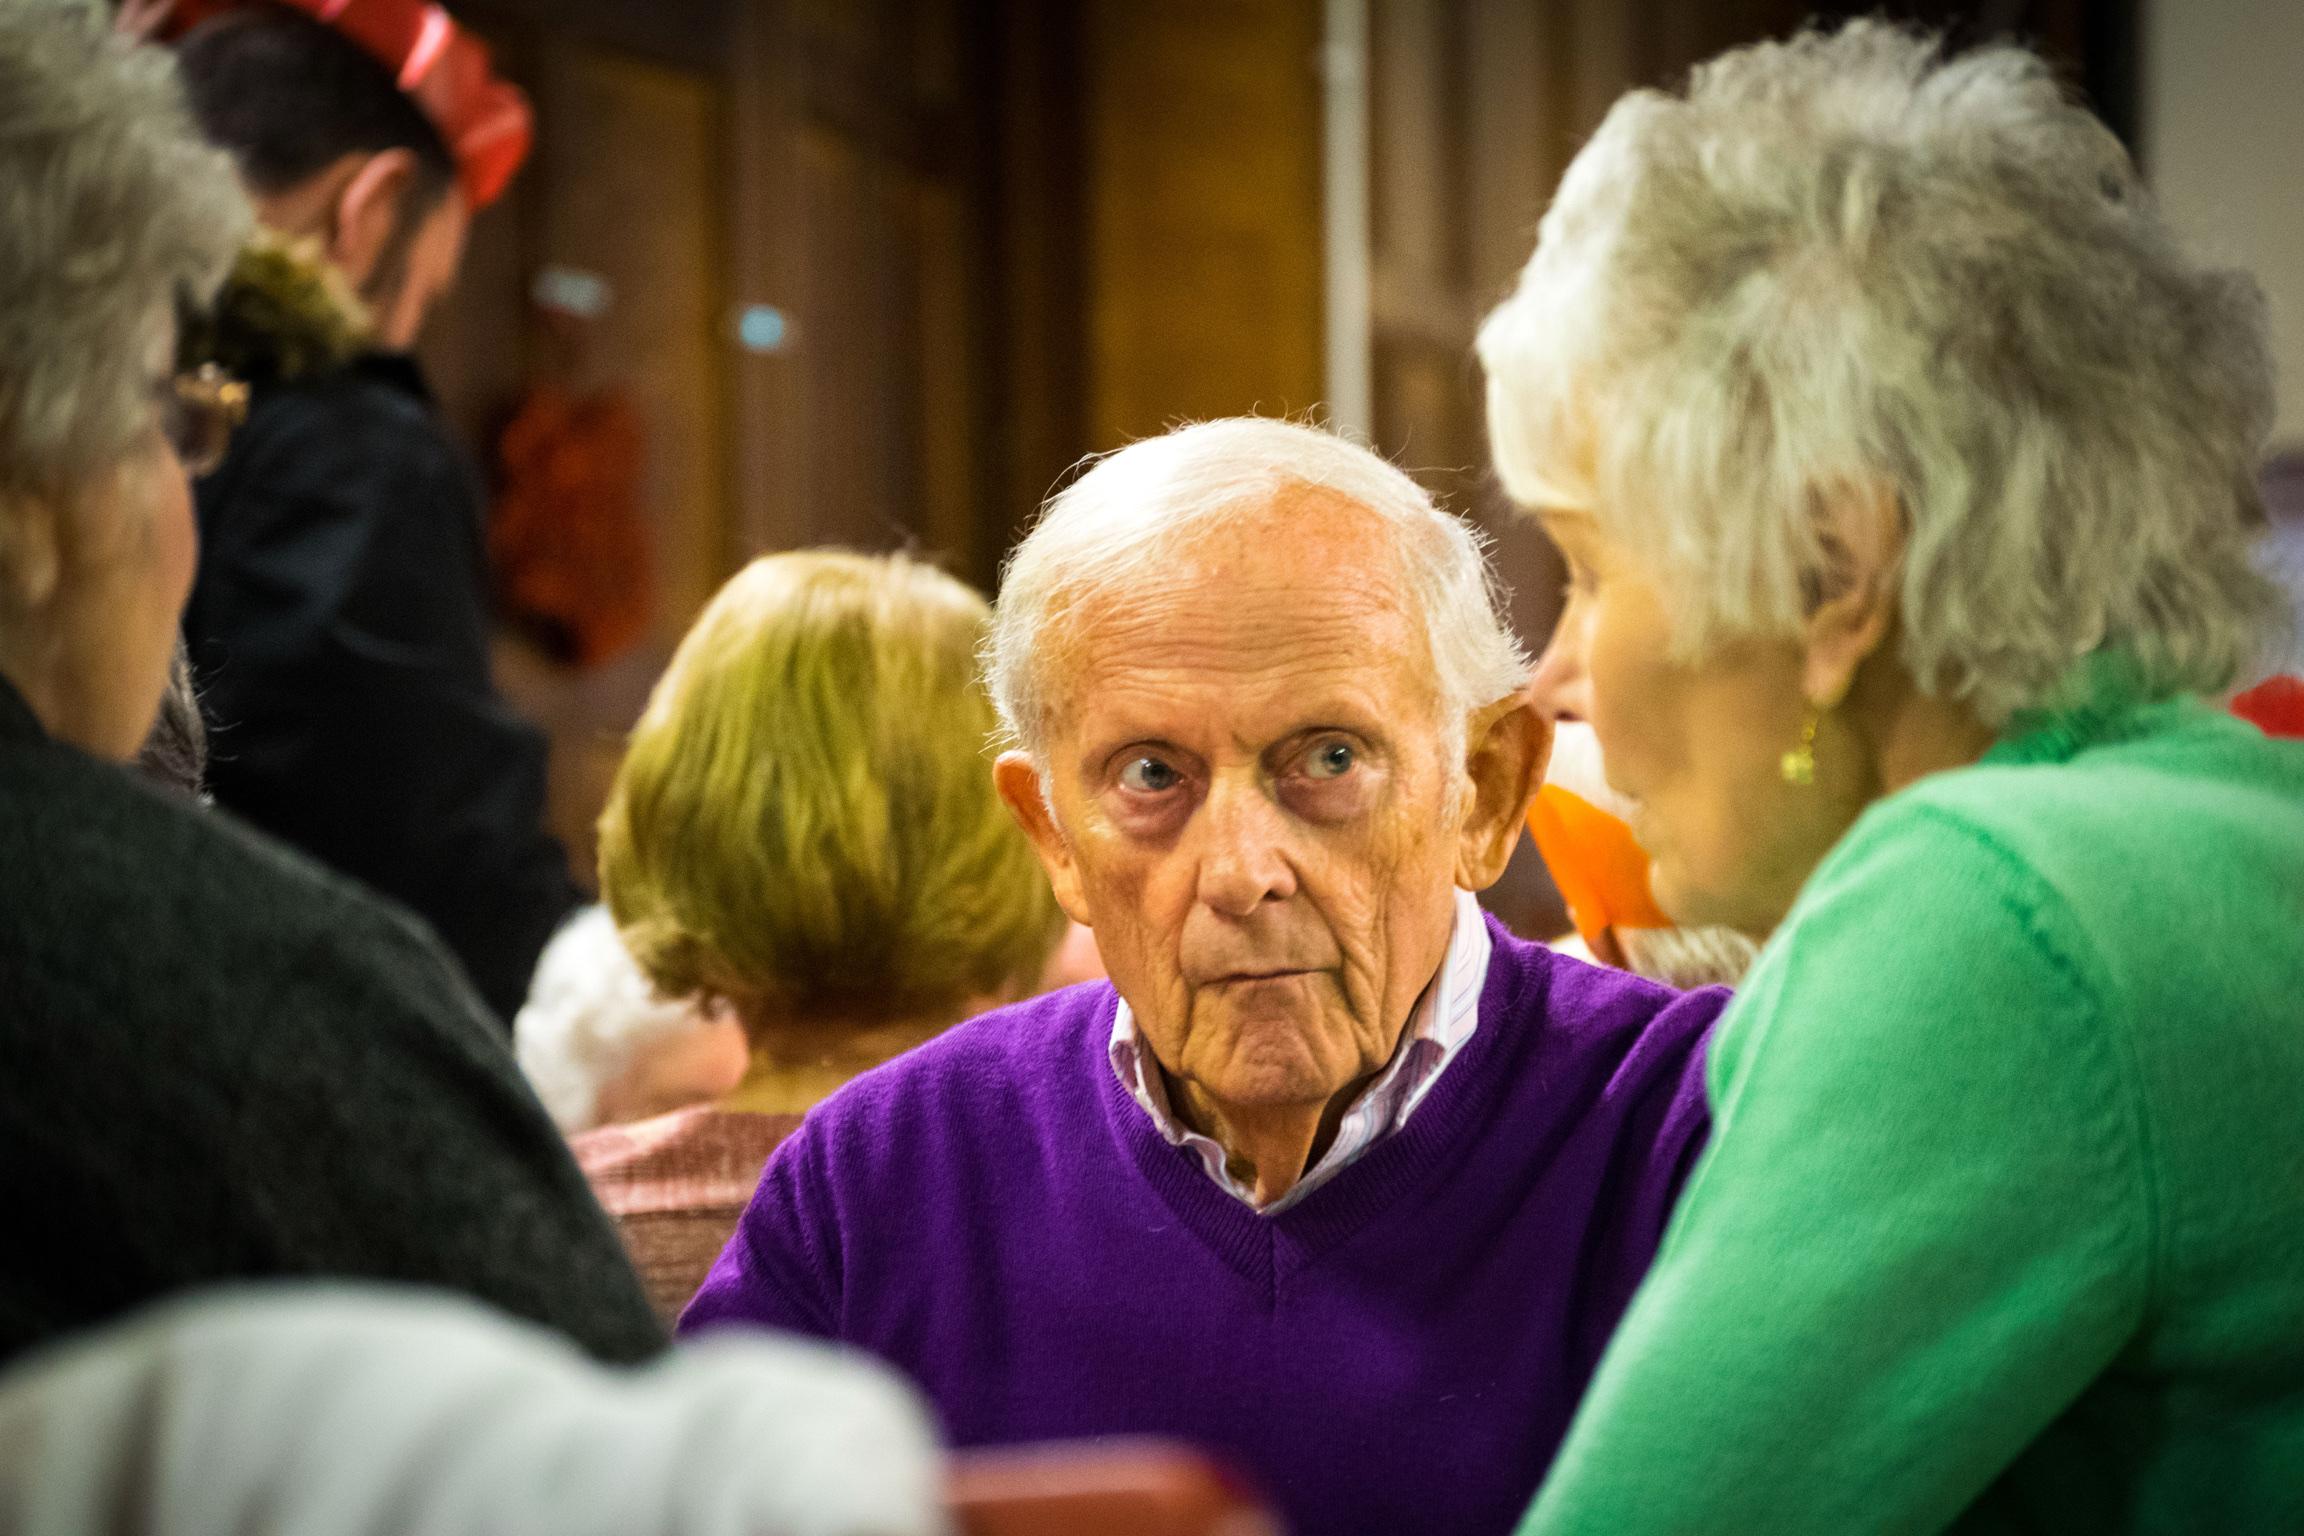 Seniors -